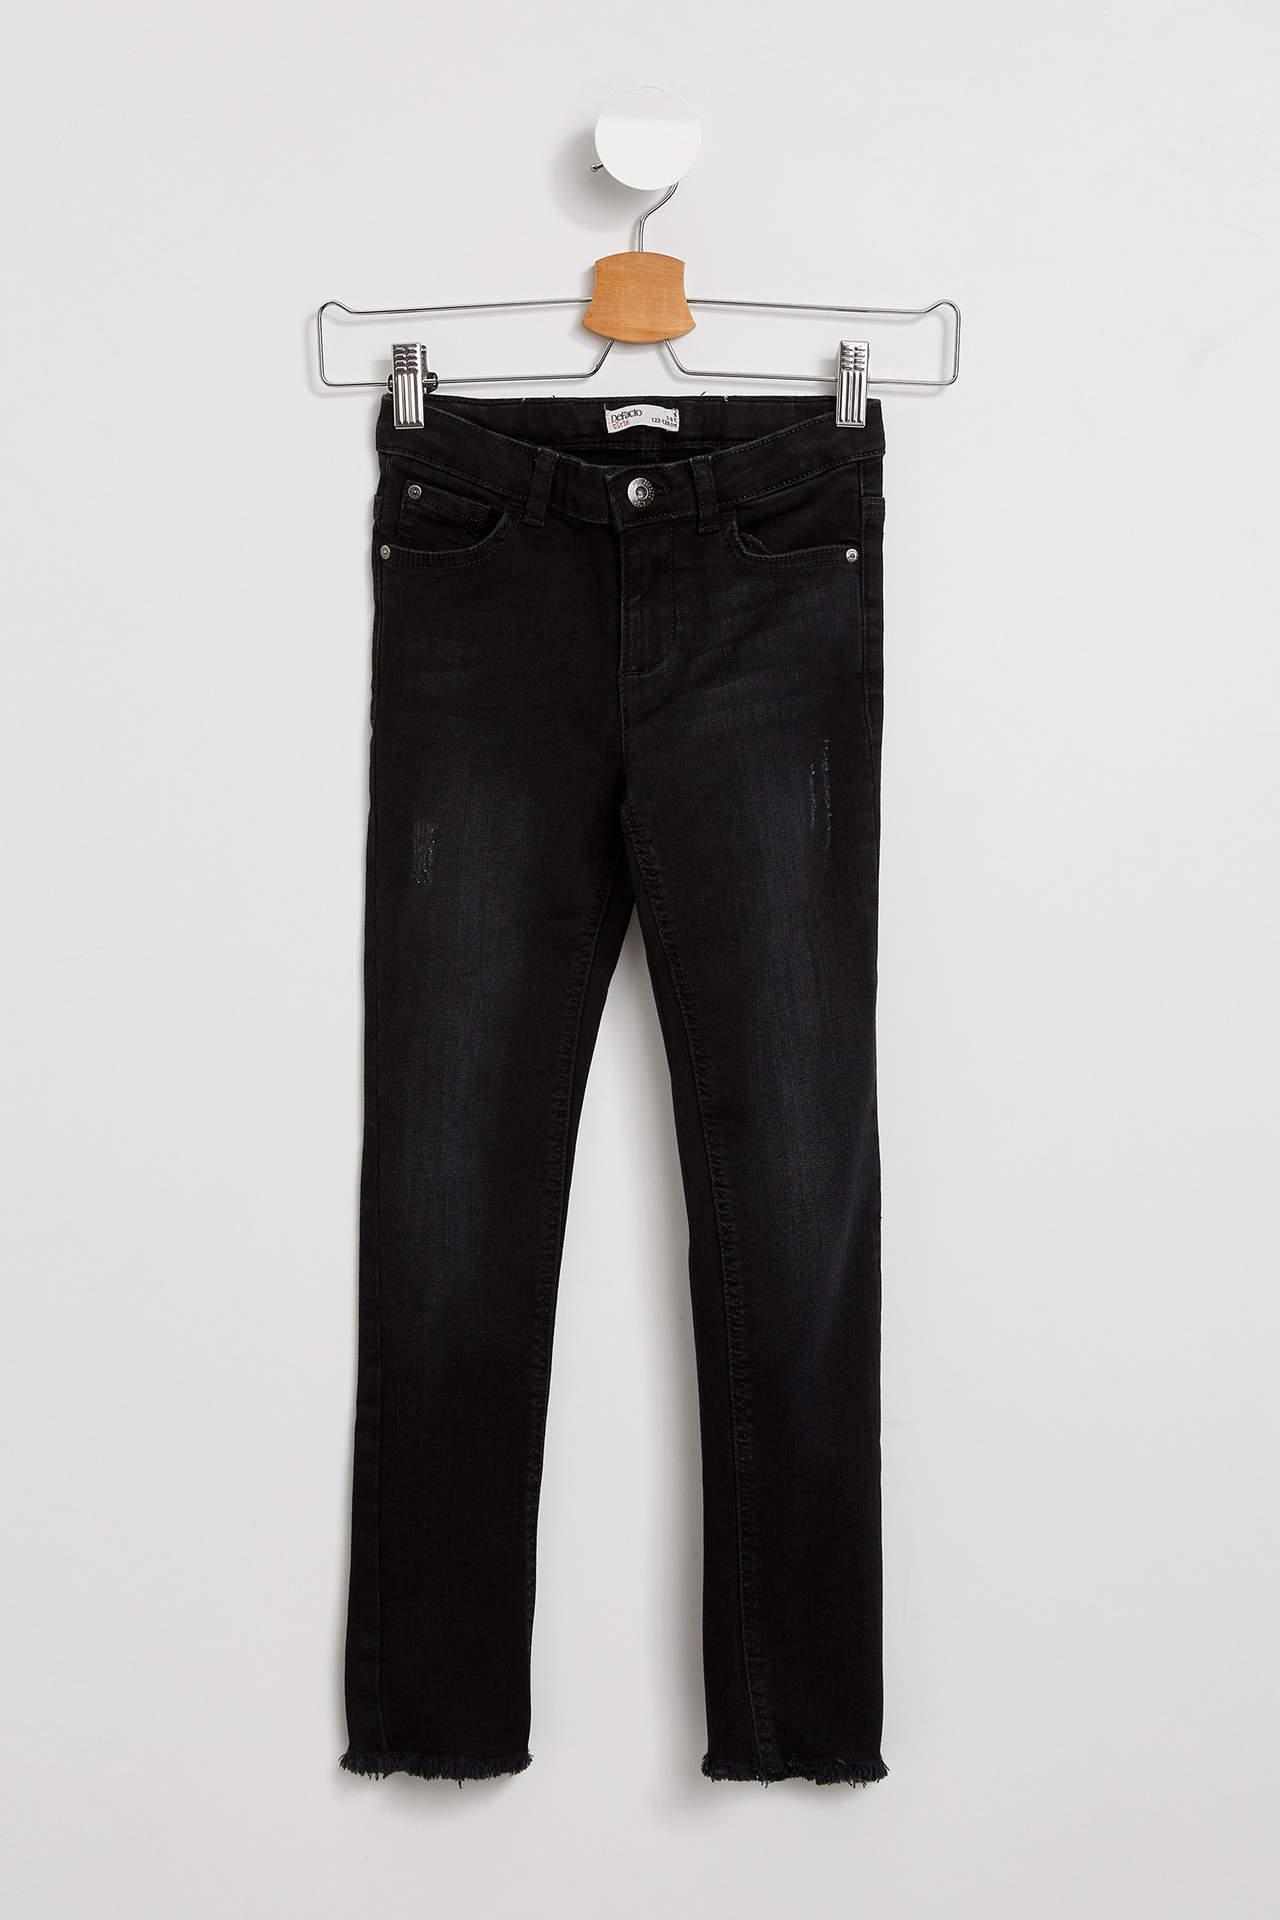 DeFacto Kız Çocuk Skinny Fit Jean Pantolon Gri female